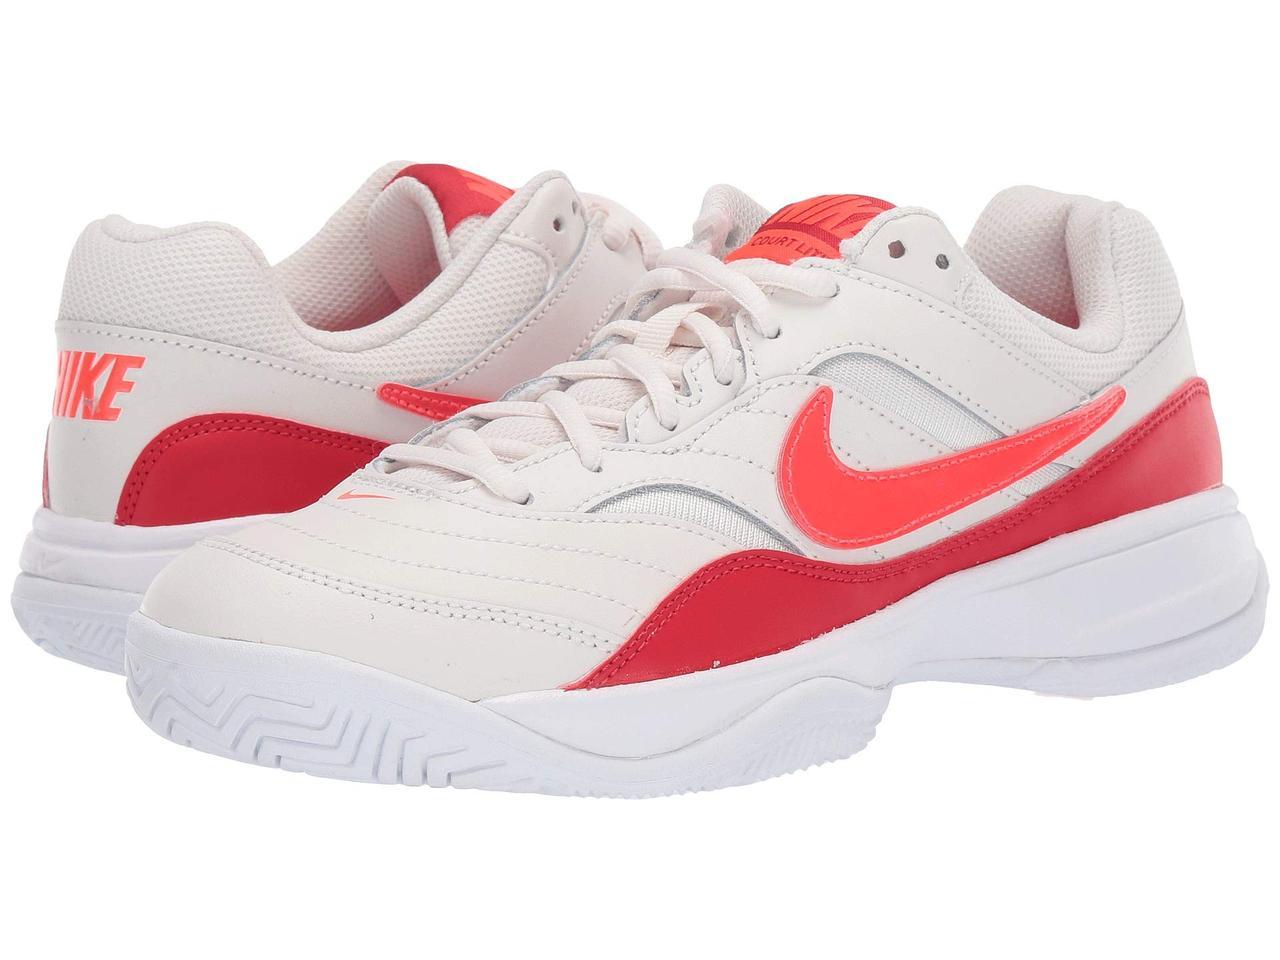 1f550cbe Кроссовки/Кеды (Оригинал) Nike Court Lite Phantom/Bright Crimson/University  Red